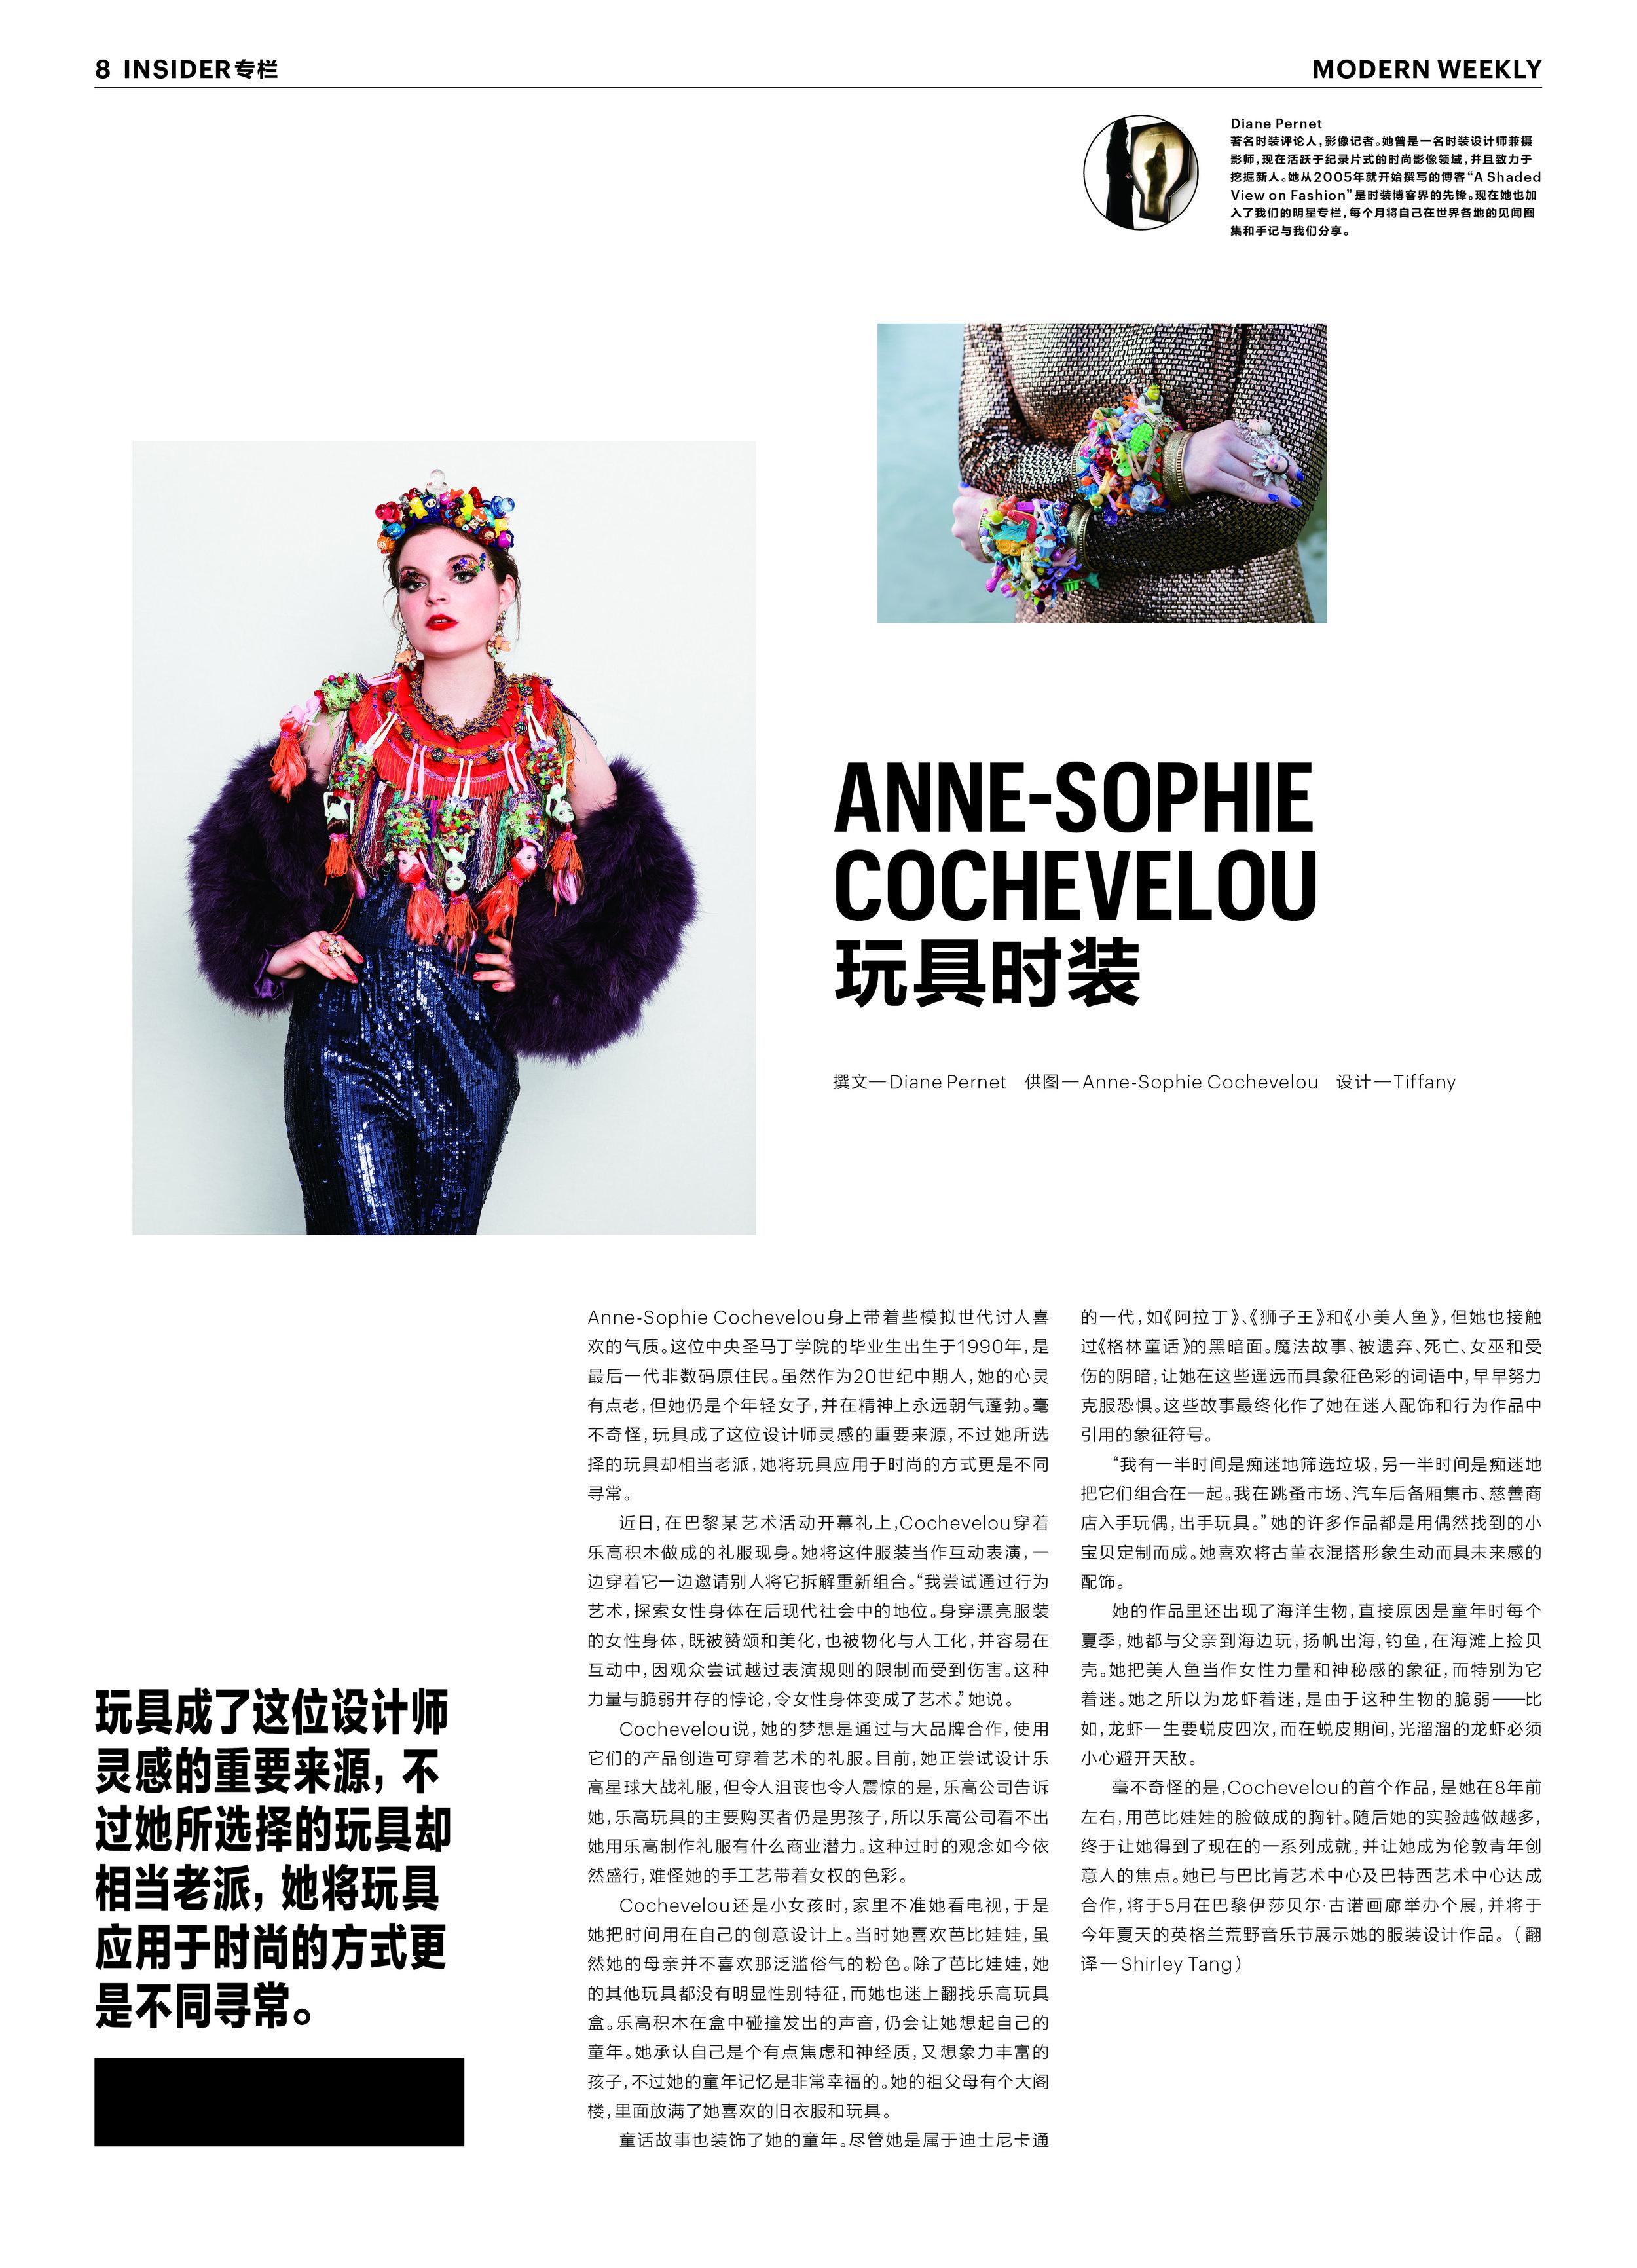 Insider, March 2016 China